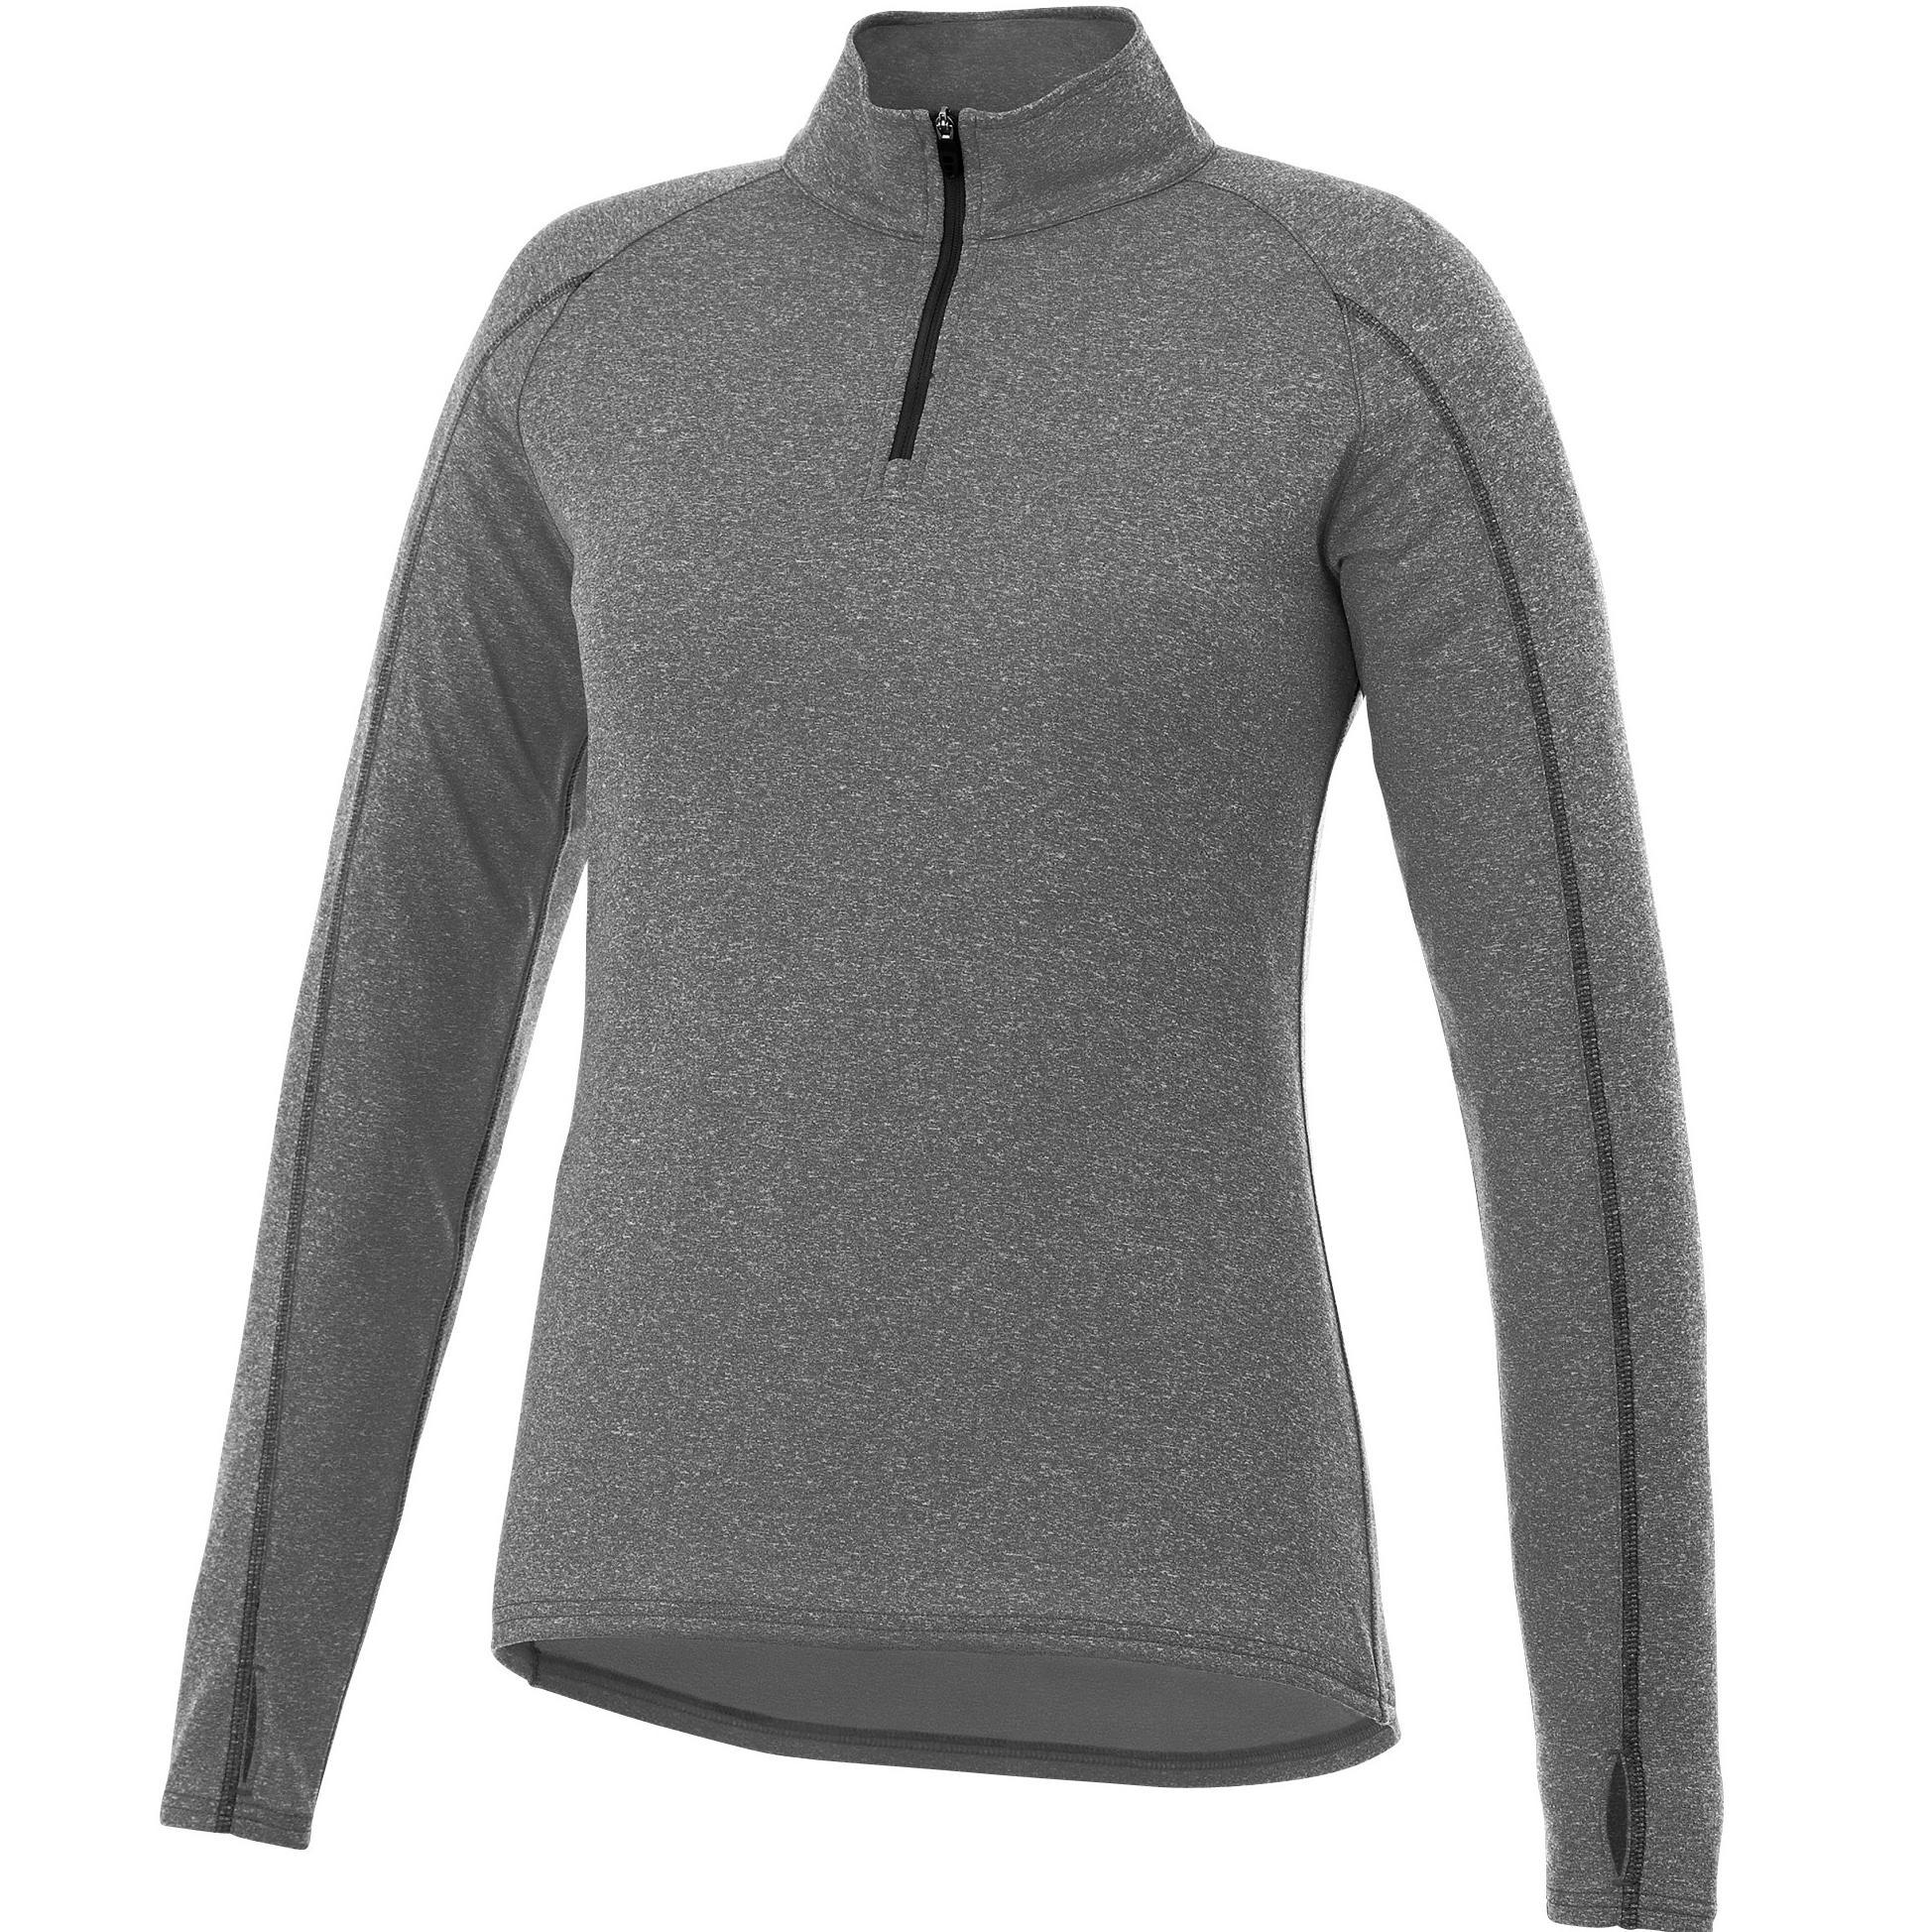 Ladies Taza 1/4 Zip Sweater - Grey Only